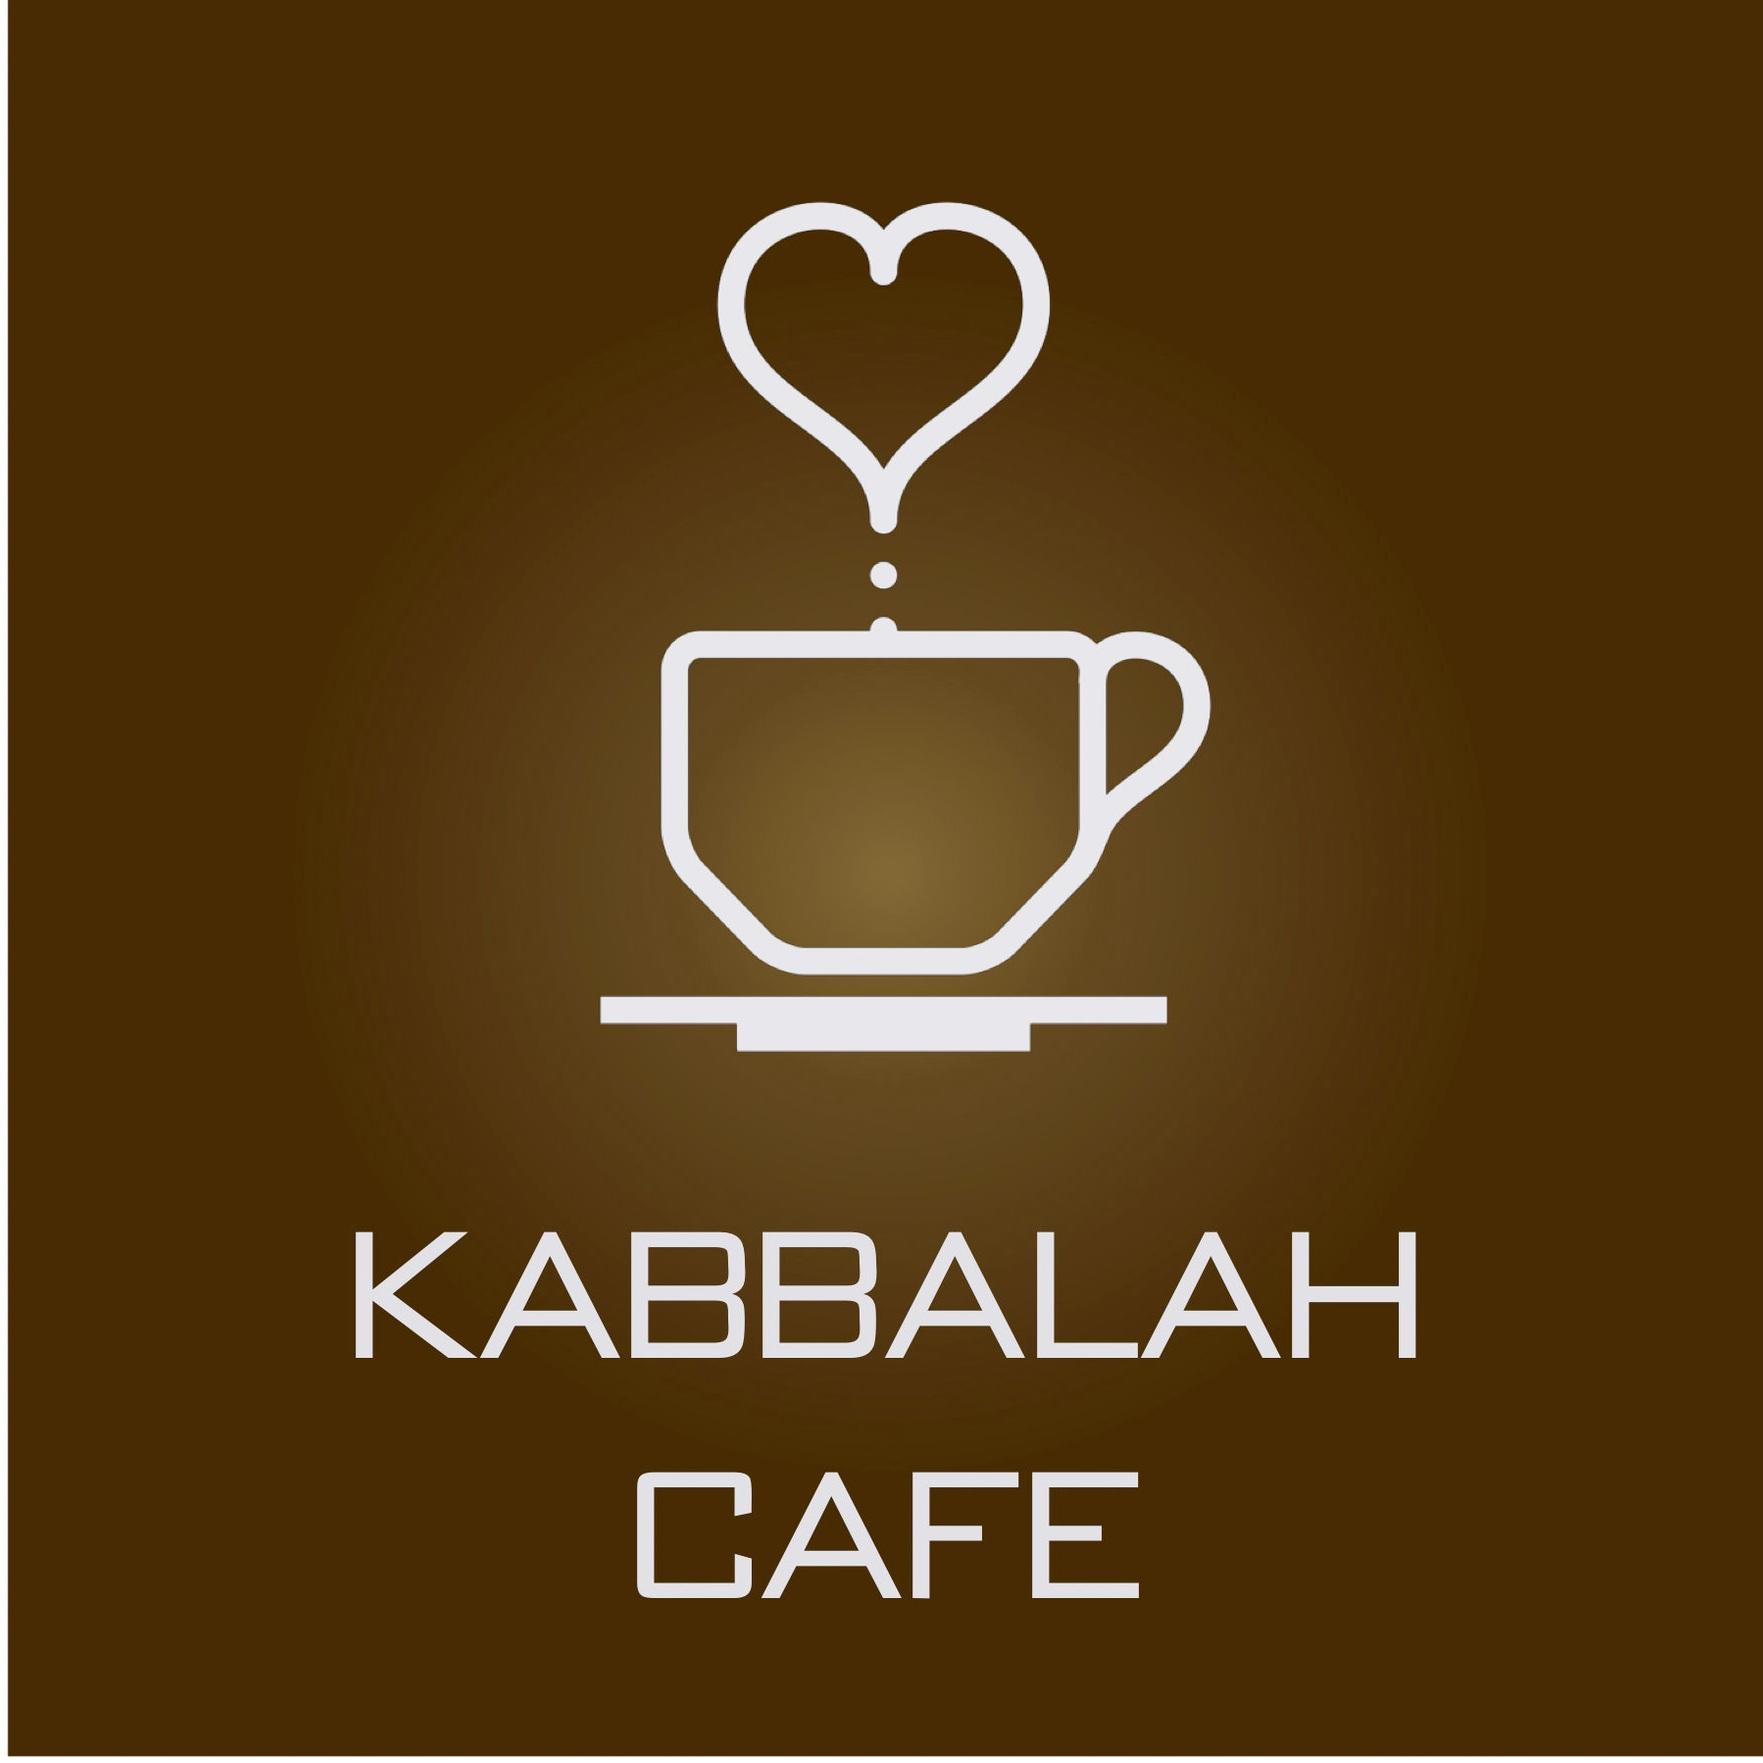 KABBALAH+CAFE.jpg